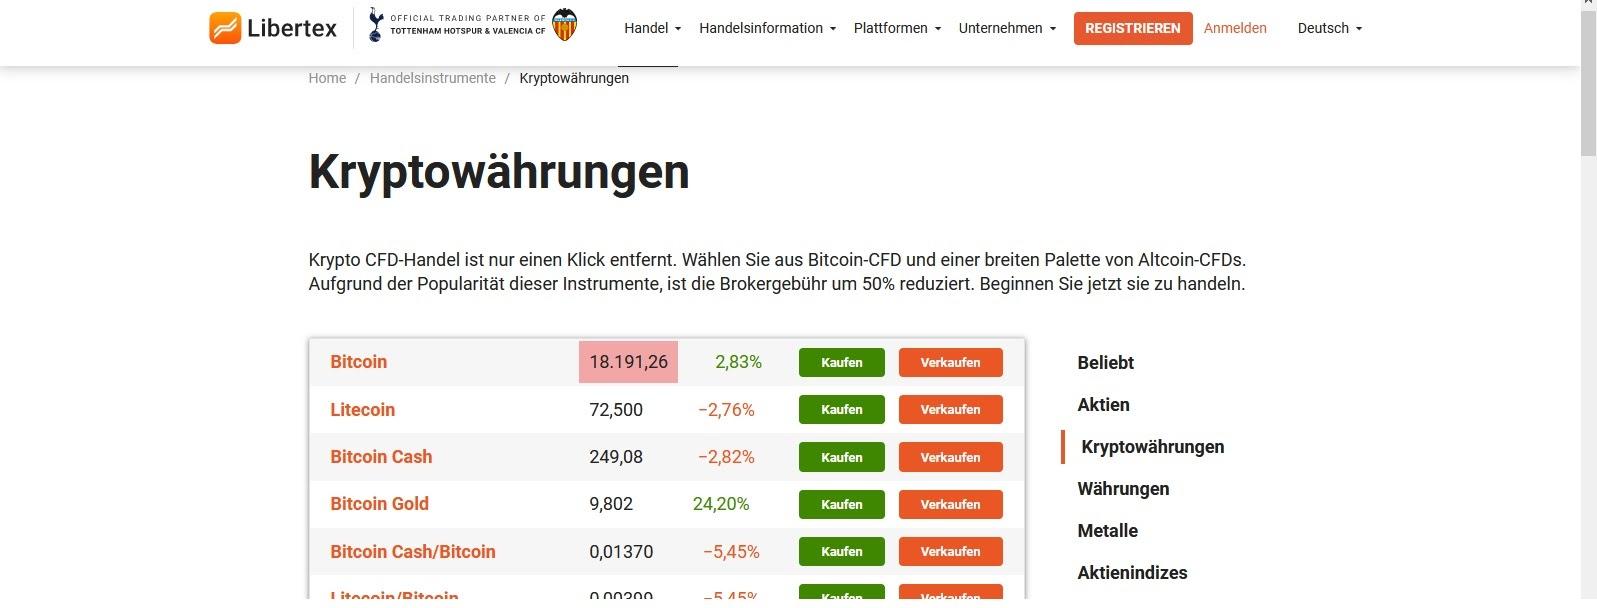 Libertex market category cryptocurrencies